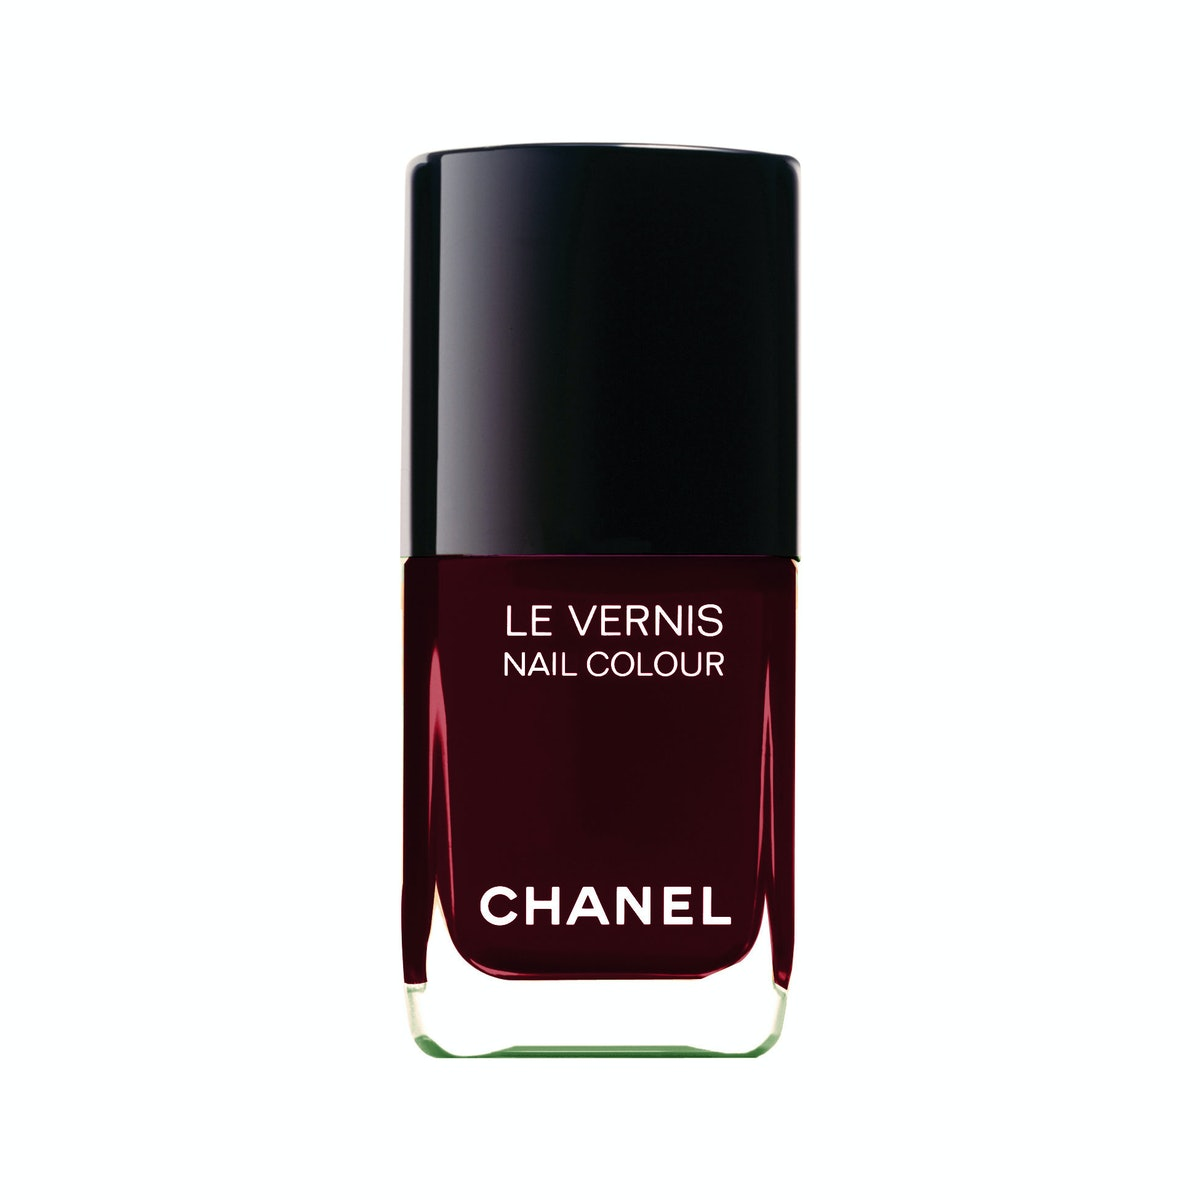 Chanel nail polish in Vamp